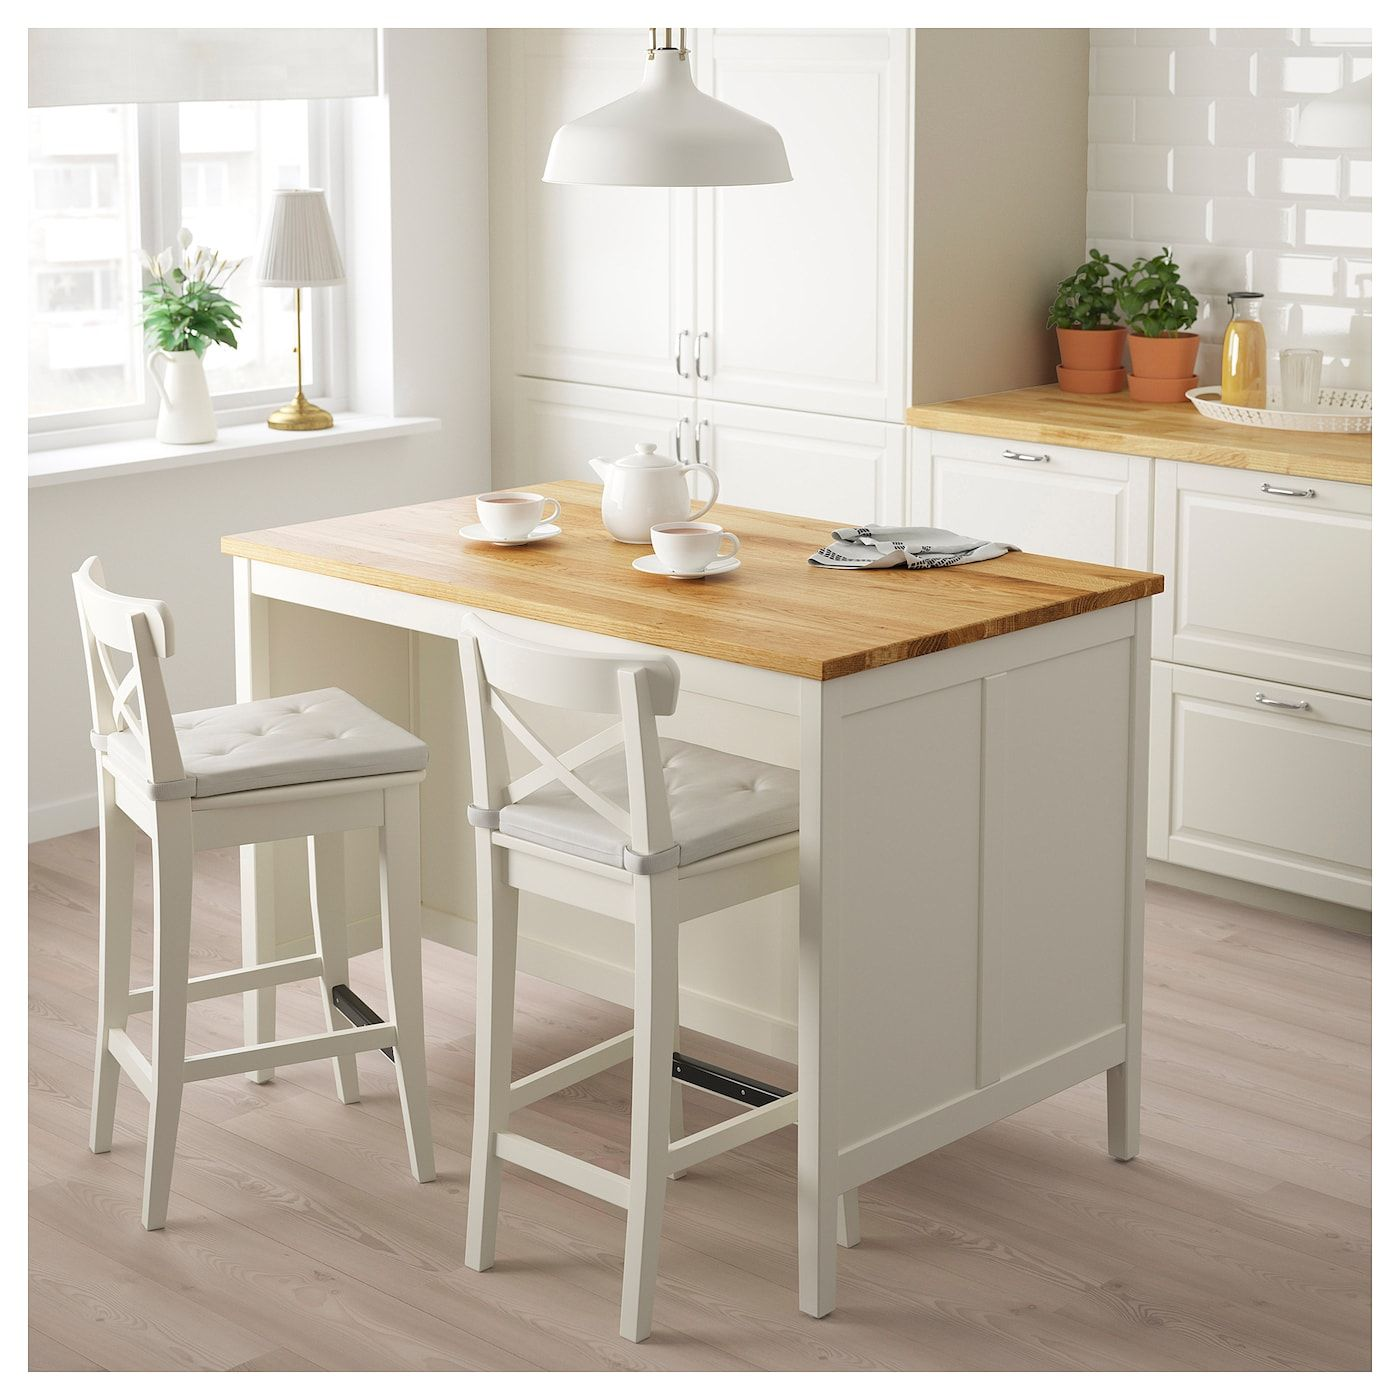 Ambienti Ikea Cucina isola per cucina ikea